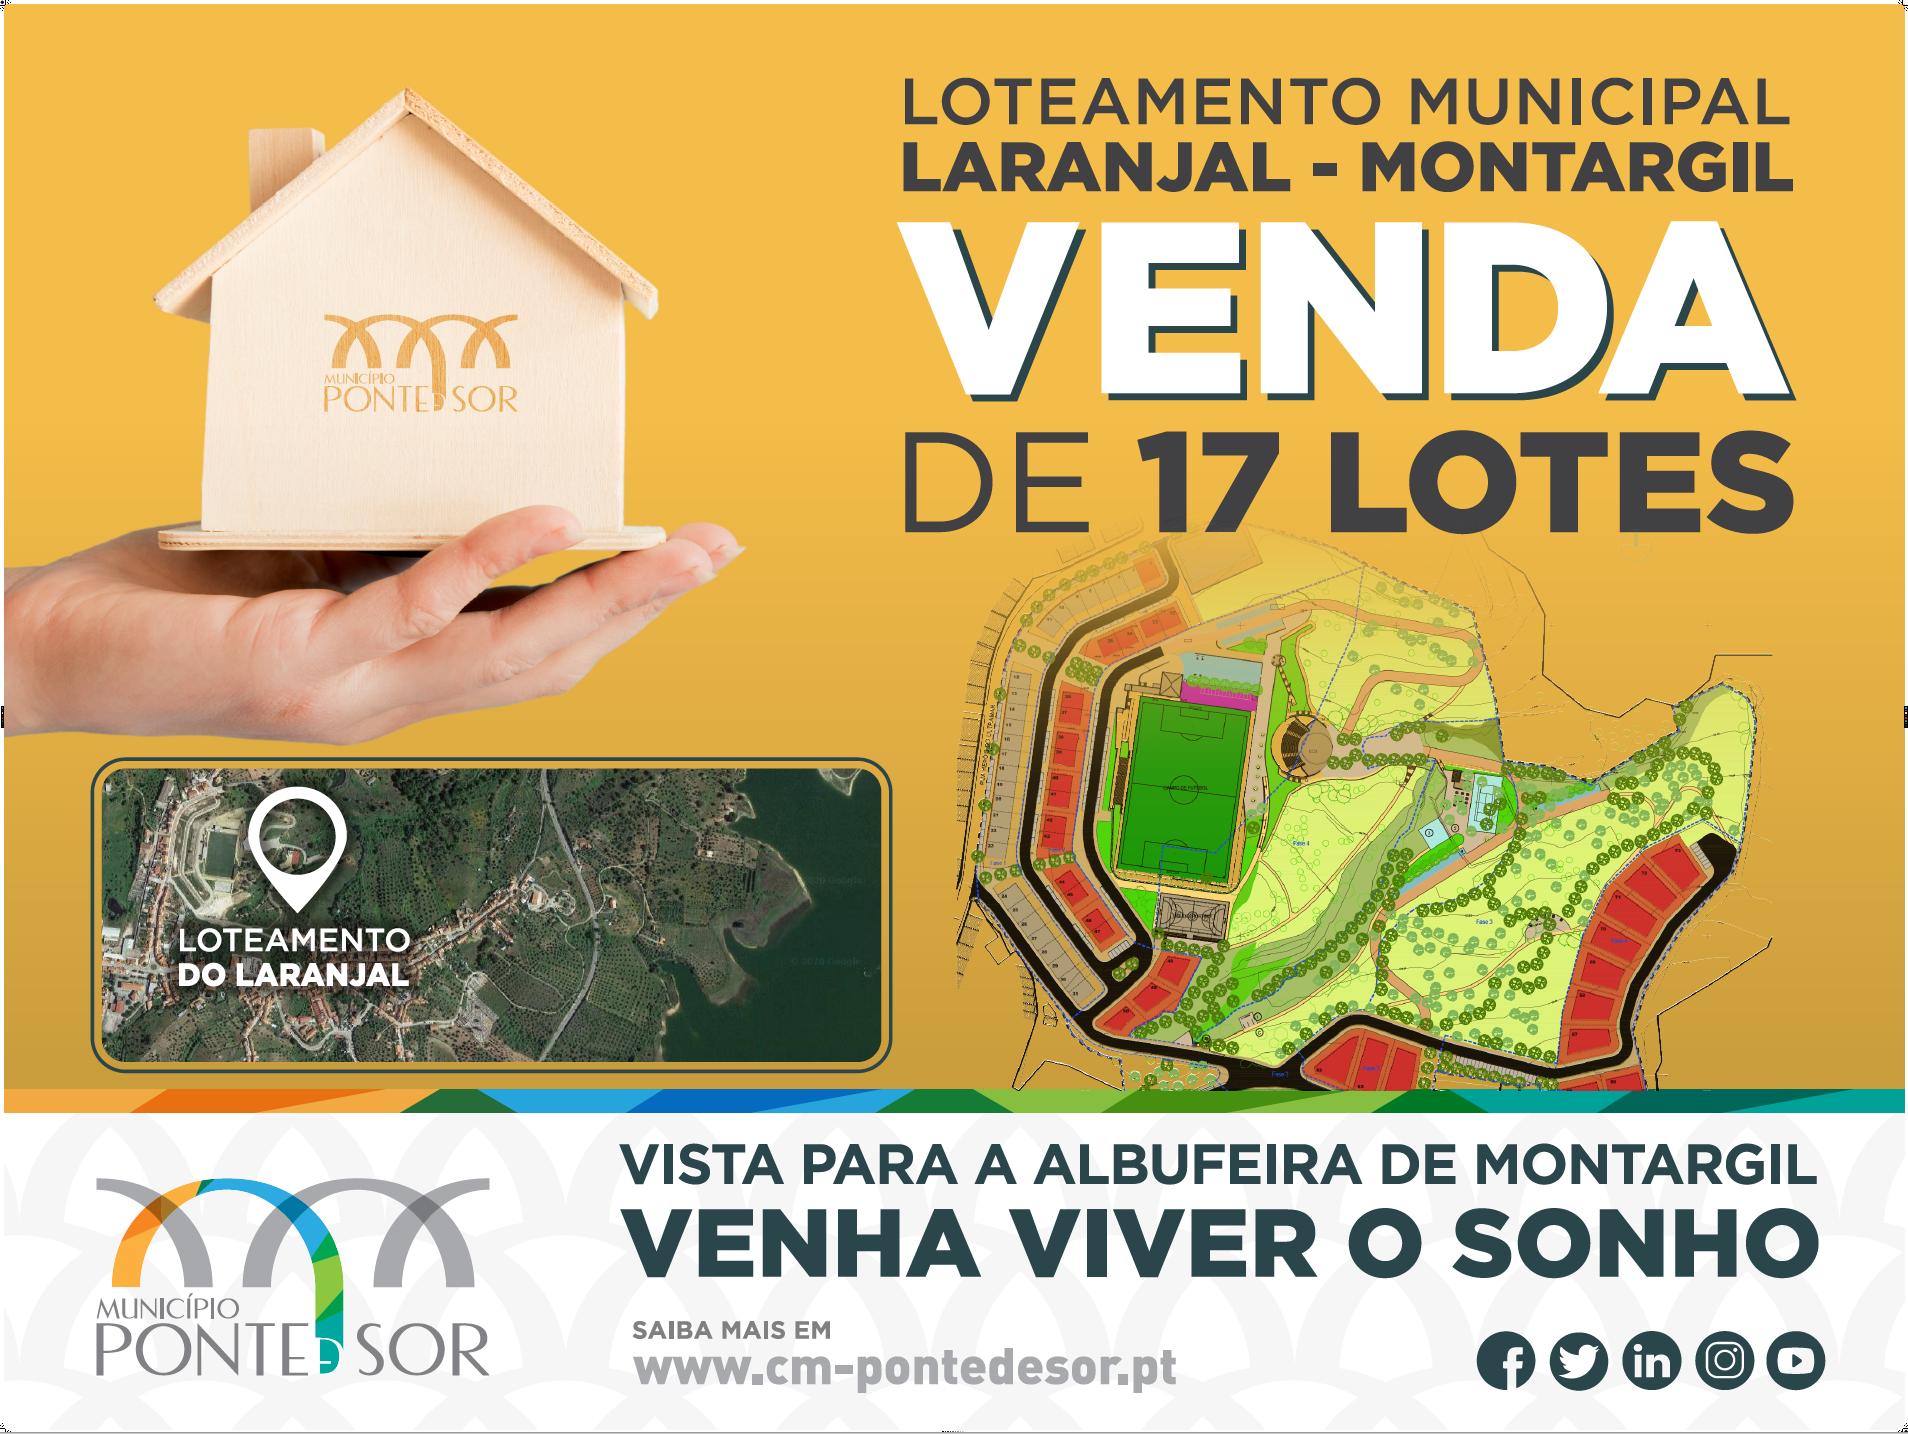 Loteamento do Laranjal – Montargil